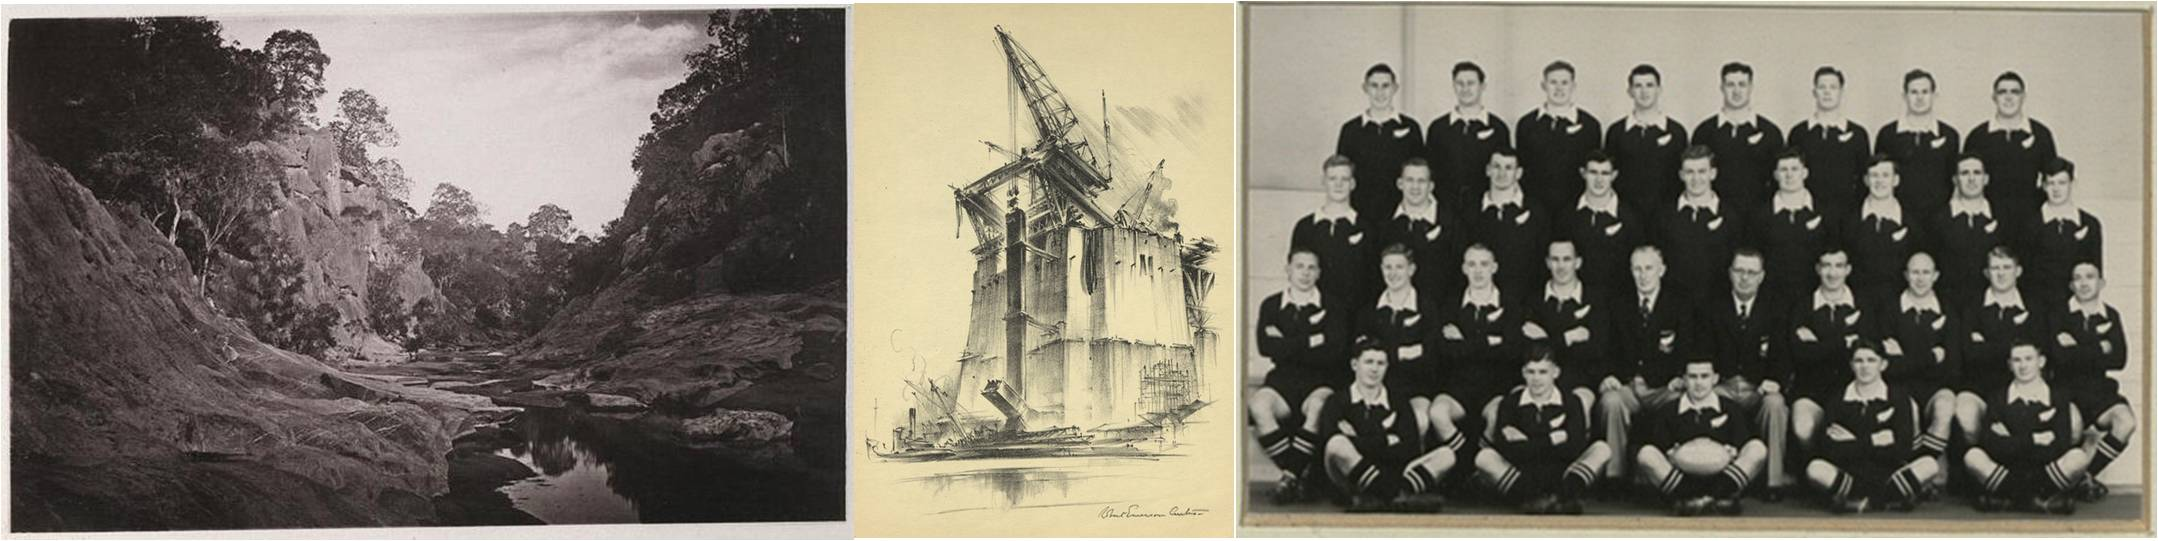 Composite image of Marble Gorge (Clarke River), 'The First Post' Sydney Harbour Bridge, All Blacks 1953-54